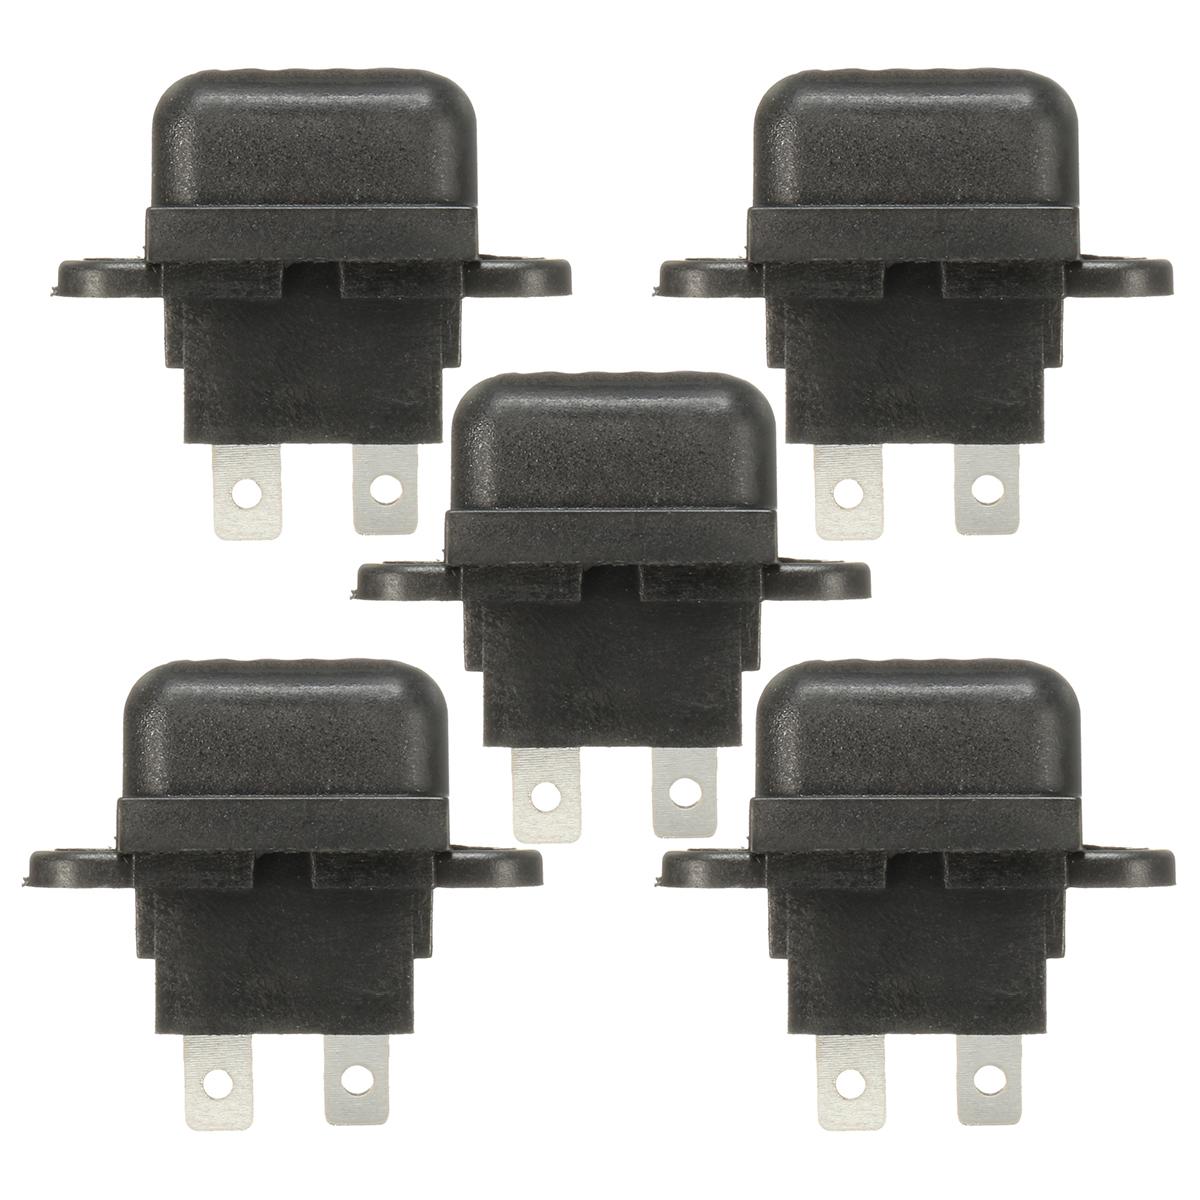 5pcs 30a amp auto blade standard fuse holder box for car. Black Bedroom Furniture Sets. Home Design Ideas